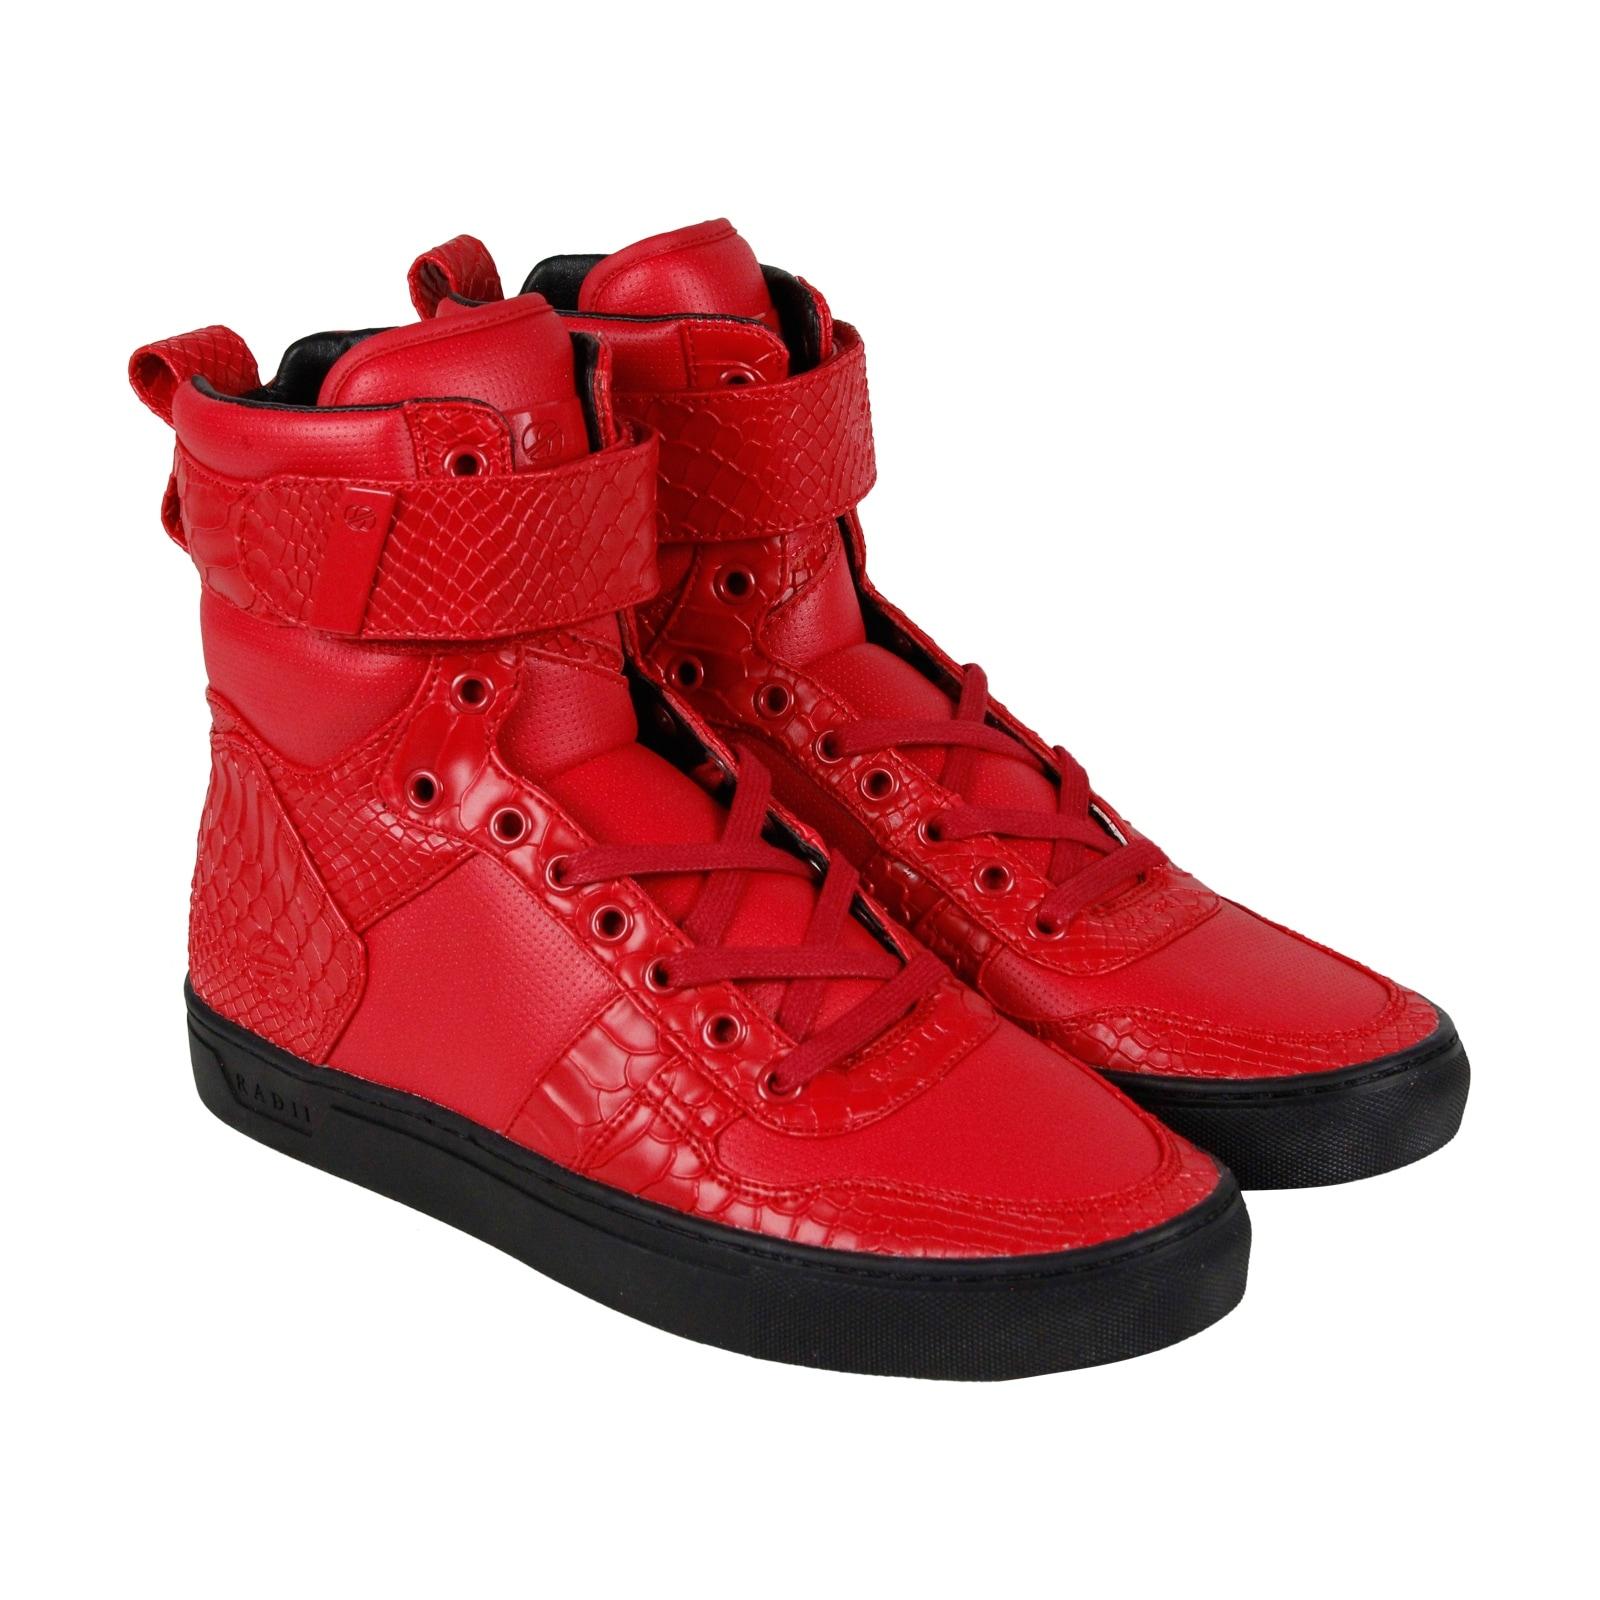 Radii Vertex Mens Red Leather High Top